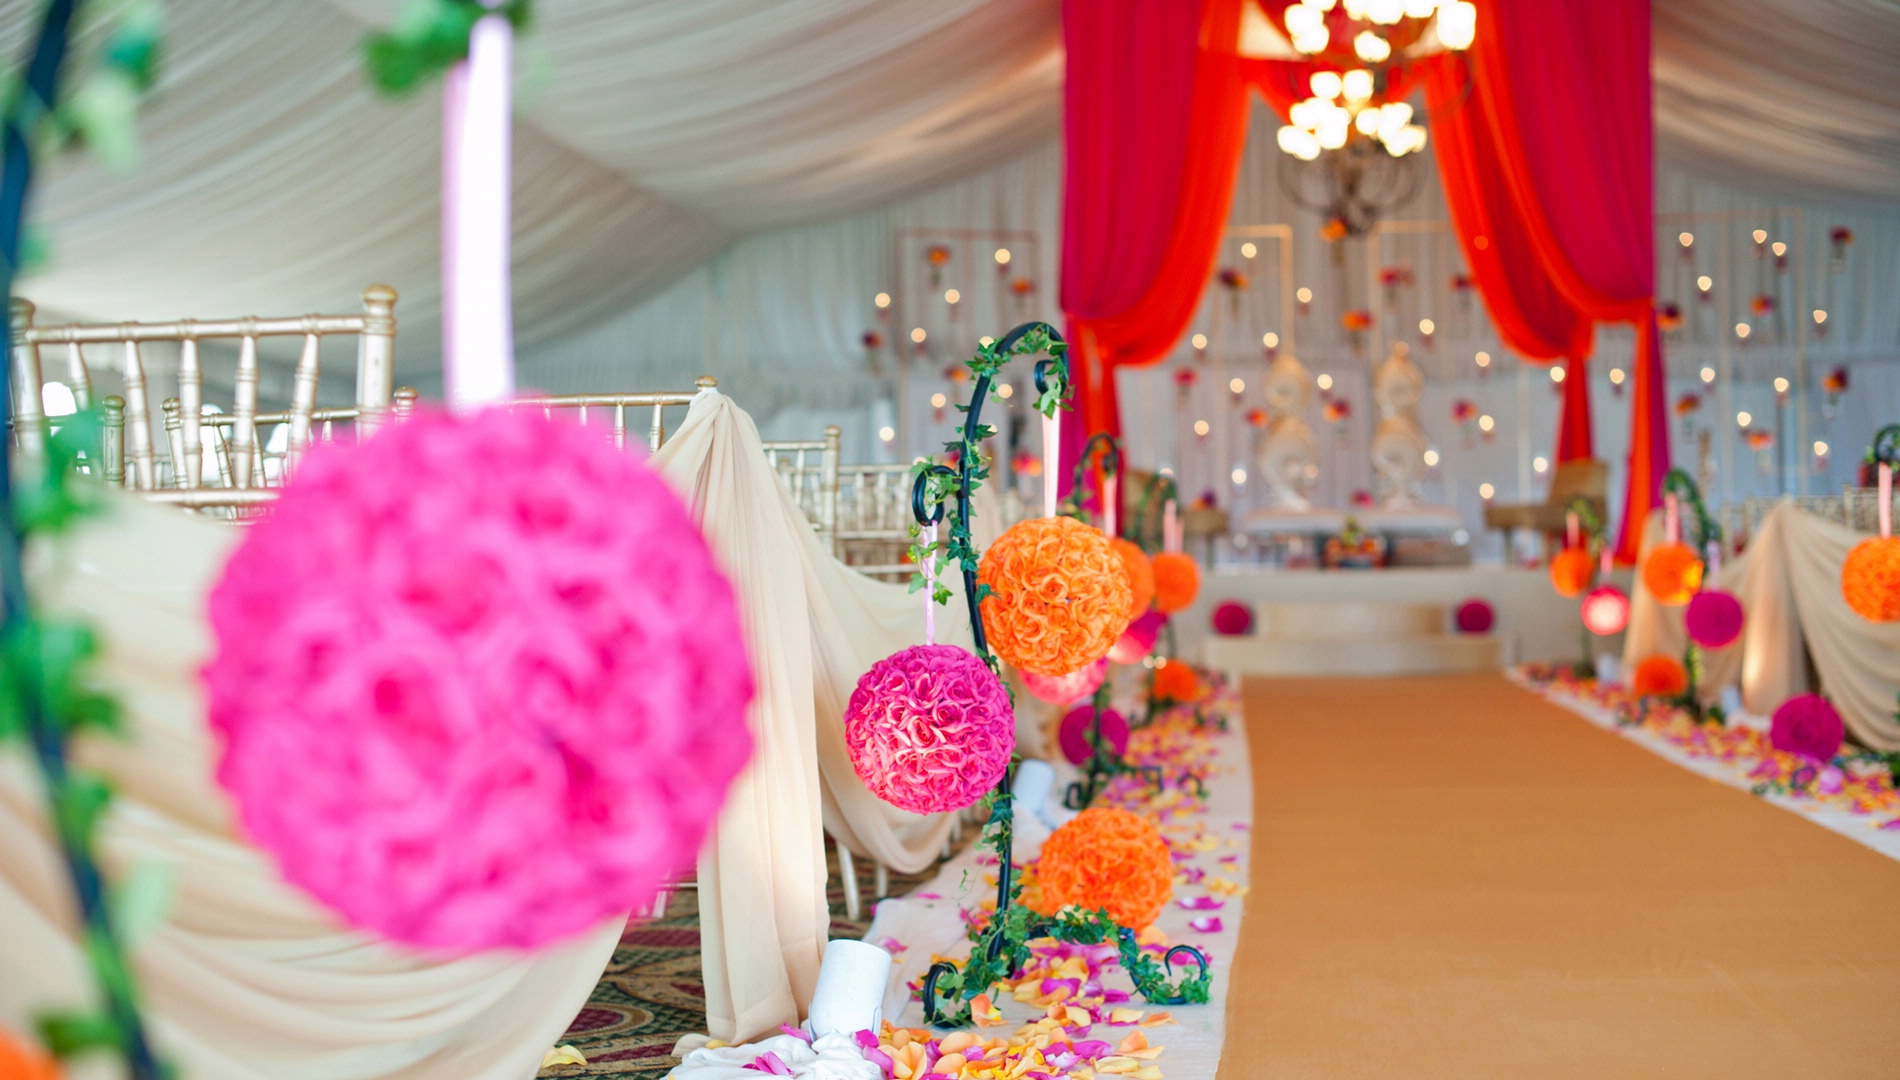 Illinois Wedding Venue   Eaglewood Resort   Benchmark Resorts & Hotels